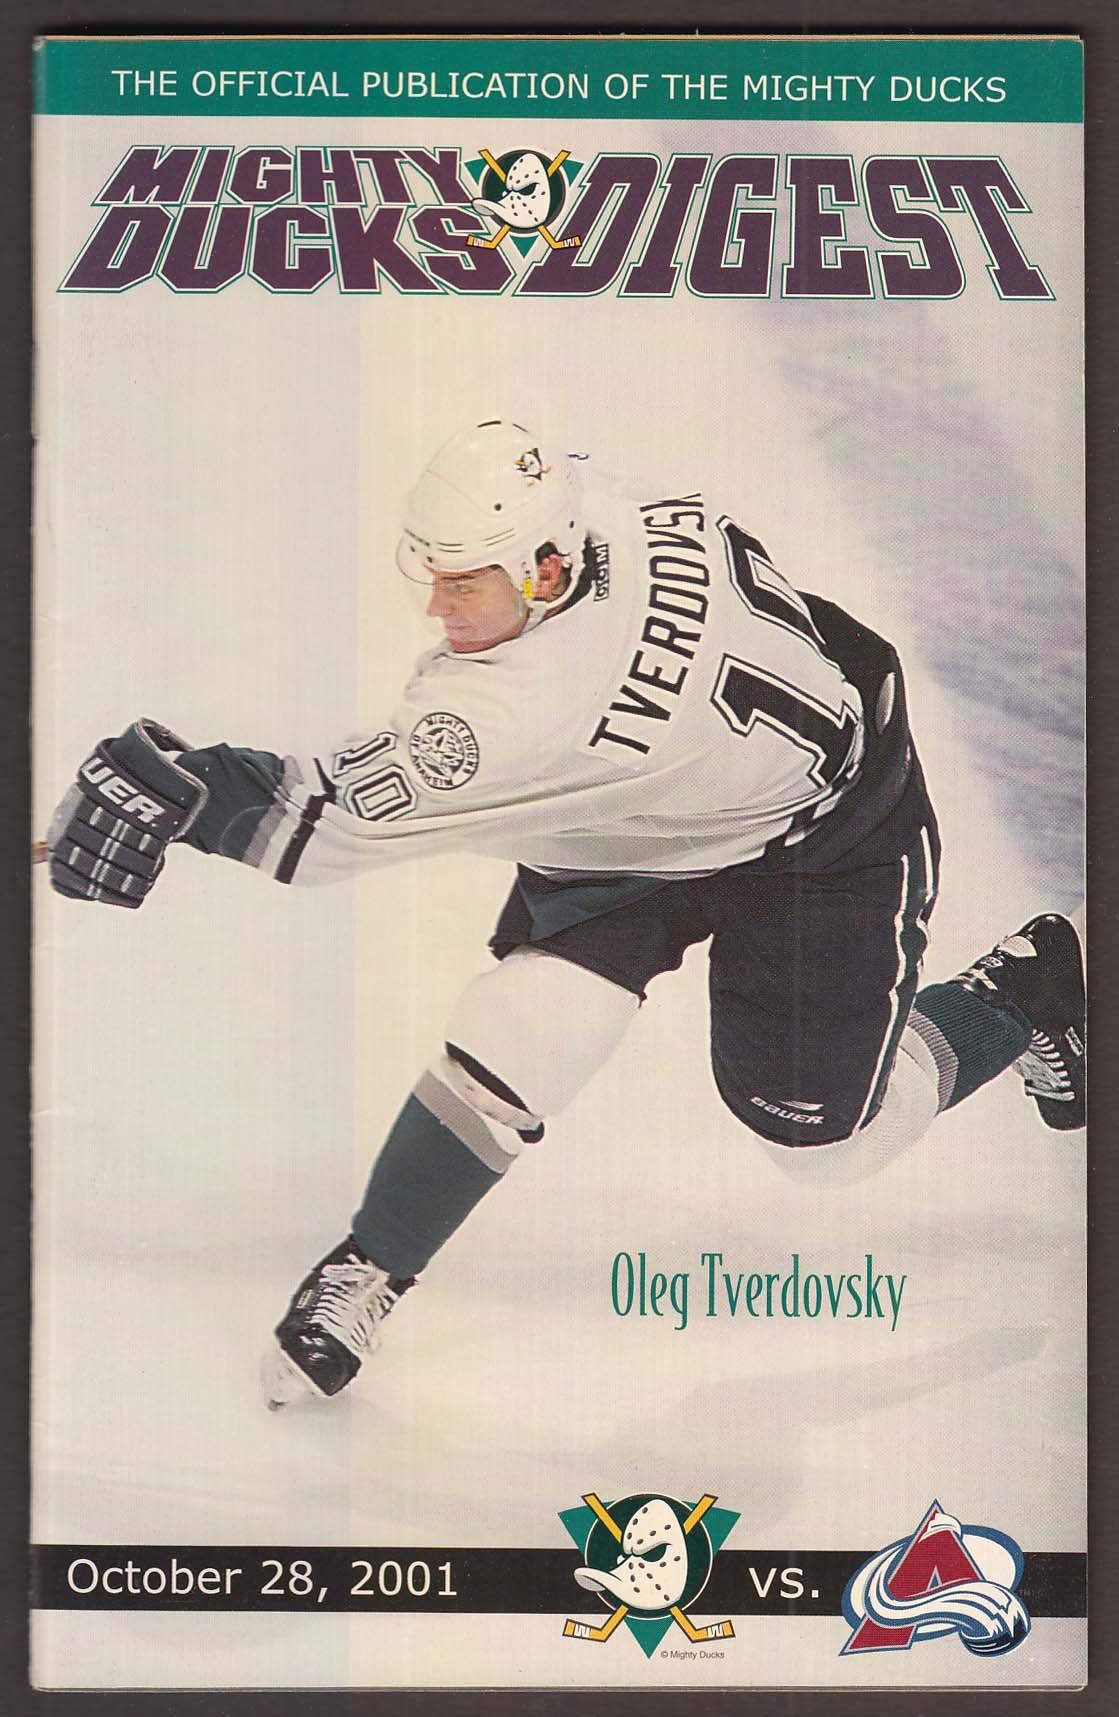 MIGHTY DUCKS DIGEST Oleg Tverdovsky ++ 10/28 2001